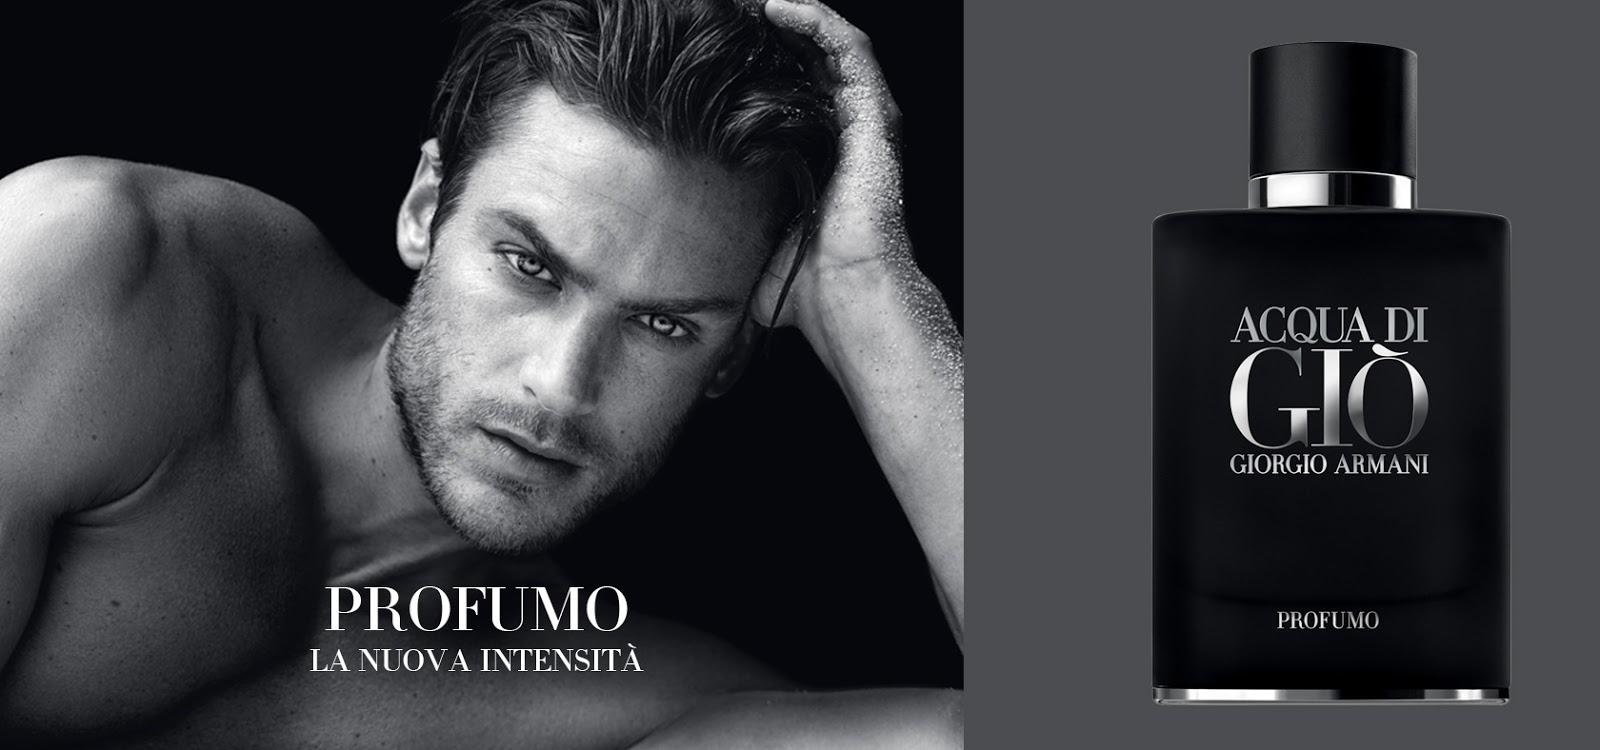 Wangianperfume Cosmetic Original Terbaik Acqua Di Gio Profumo By